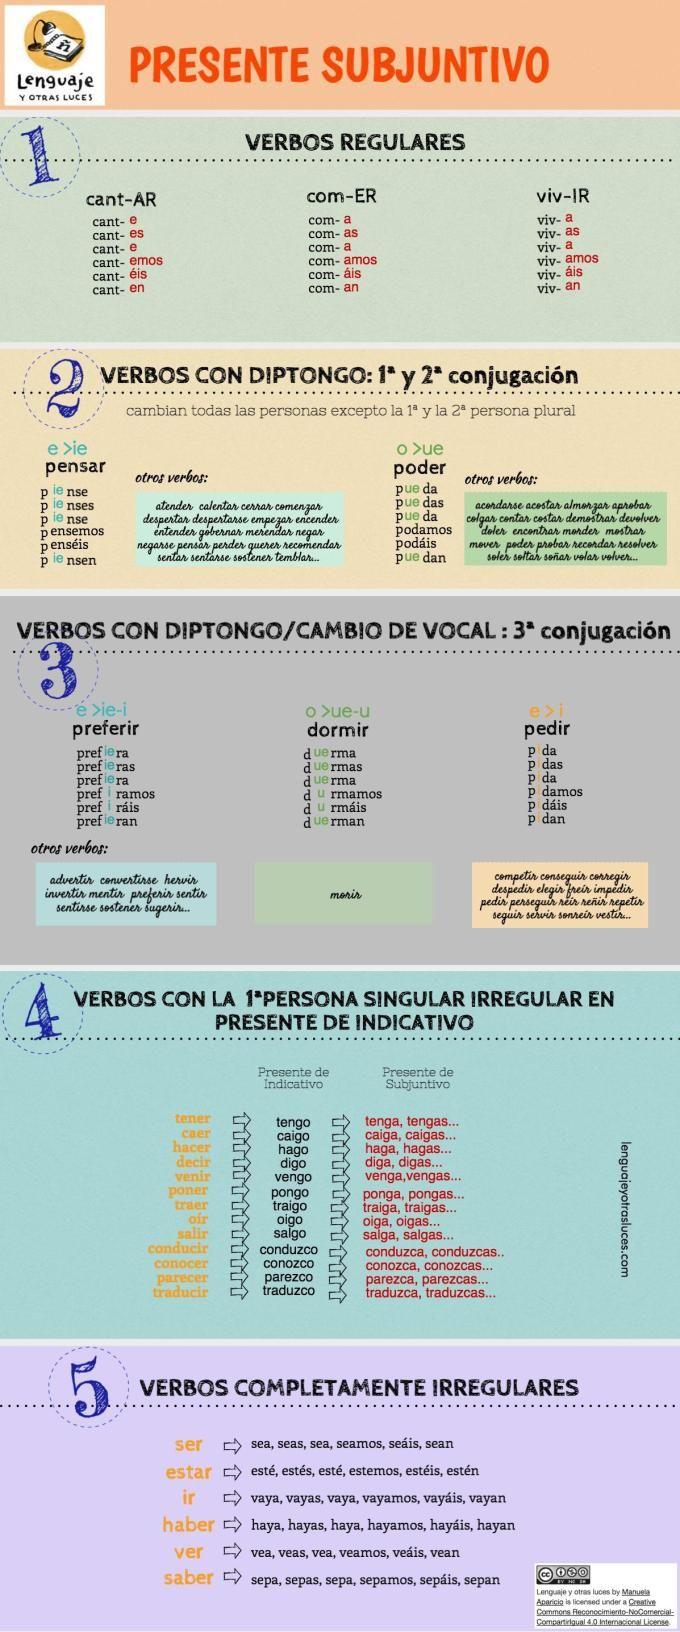 Presente Subjuntivo Infografia Jpeg 680 1 632 Pixels